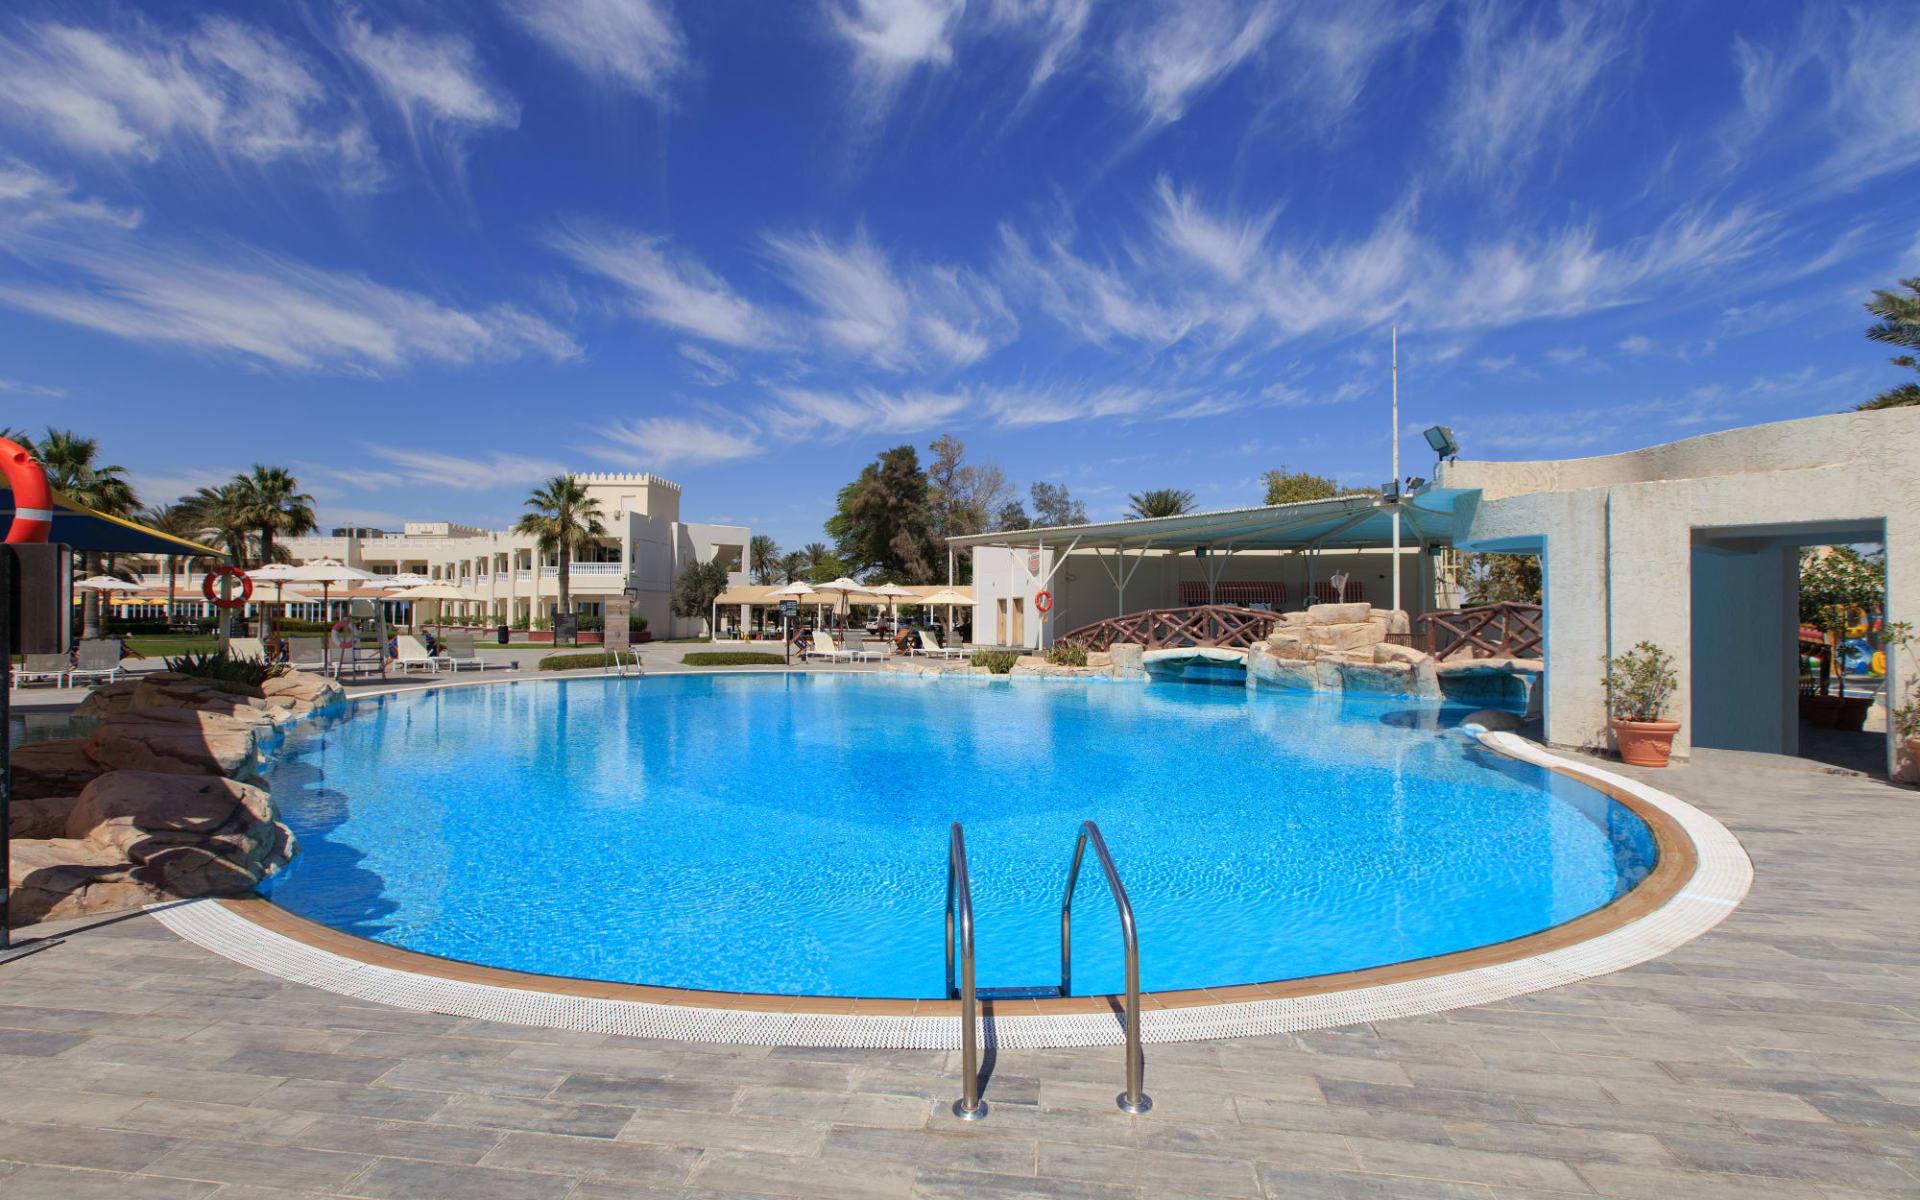 Sealine Beach A Murwab Resort in Doha: Swimming Pool 3